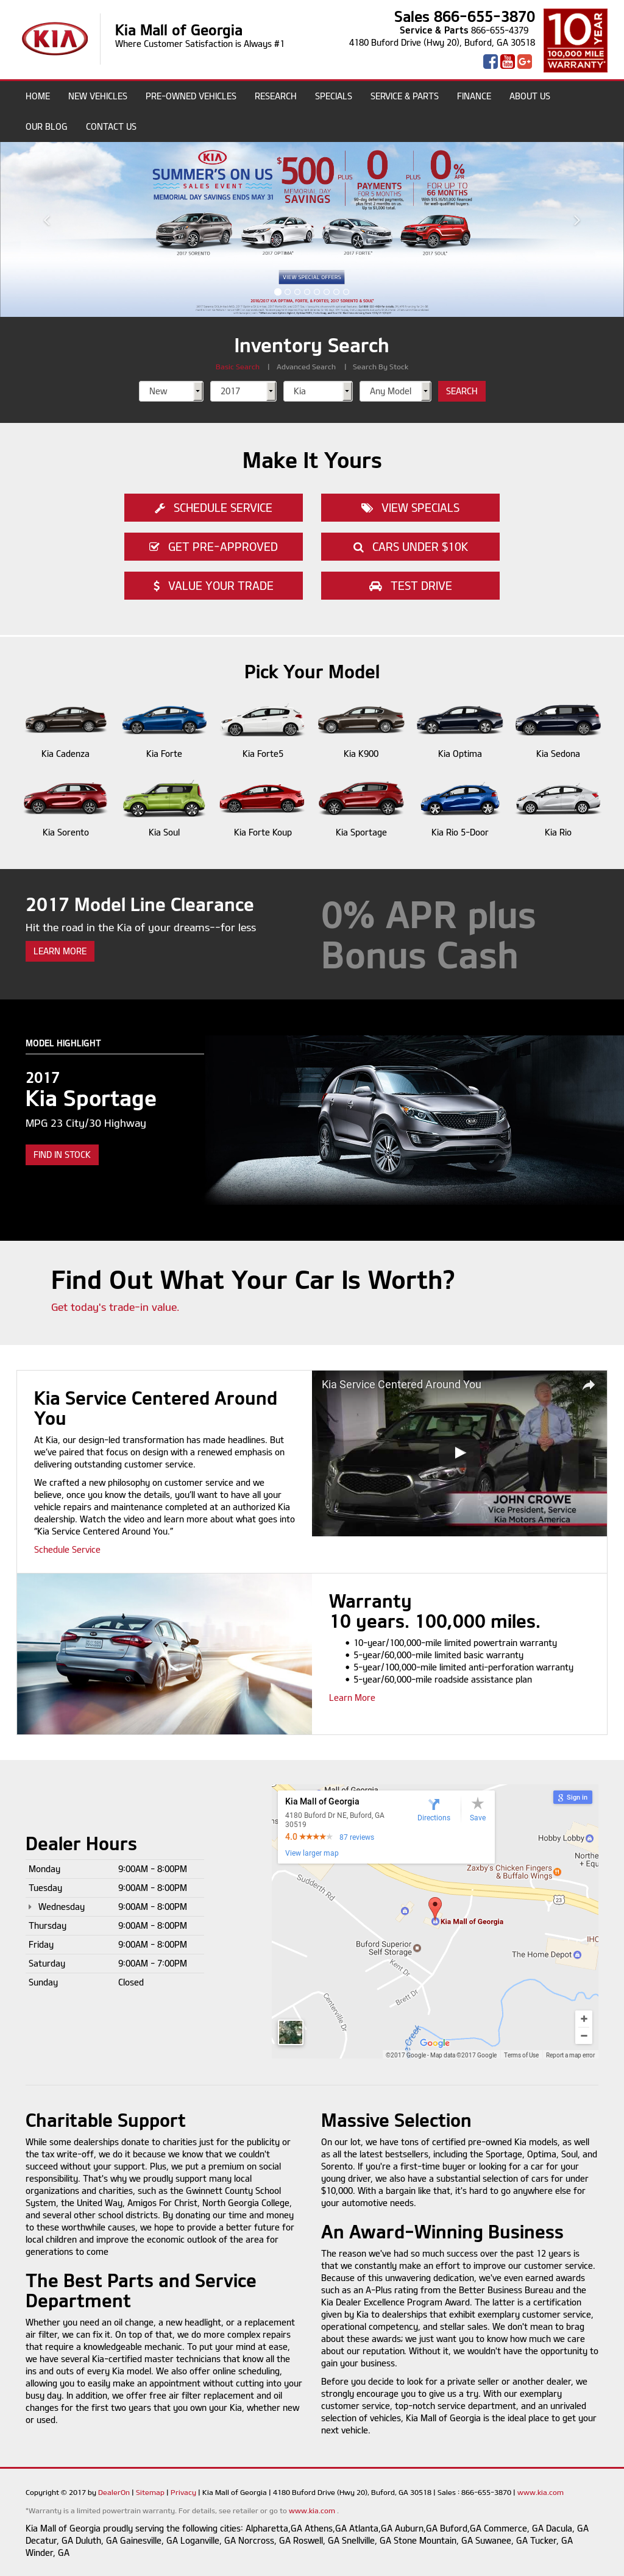 Kia Mall Of Georgia Website History